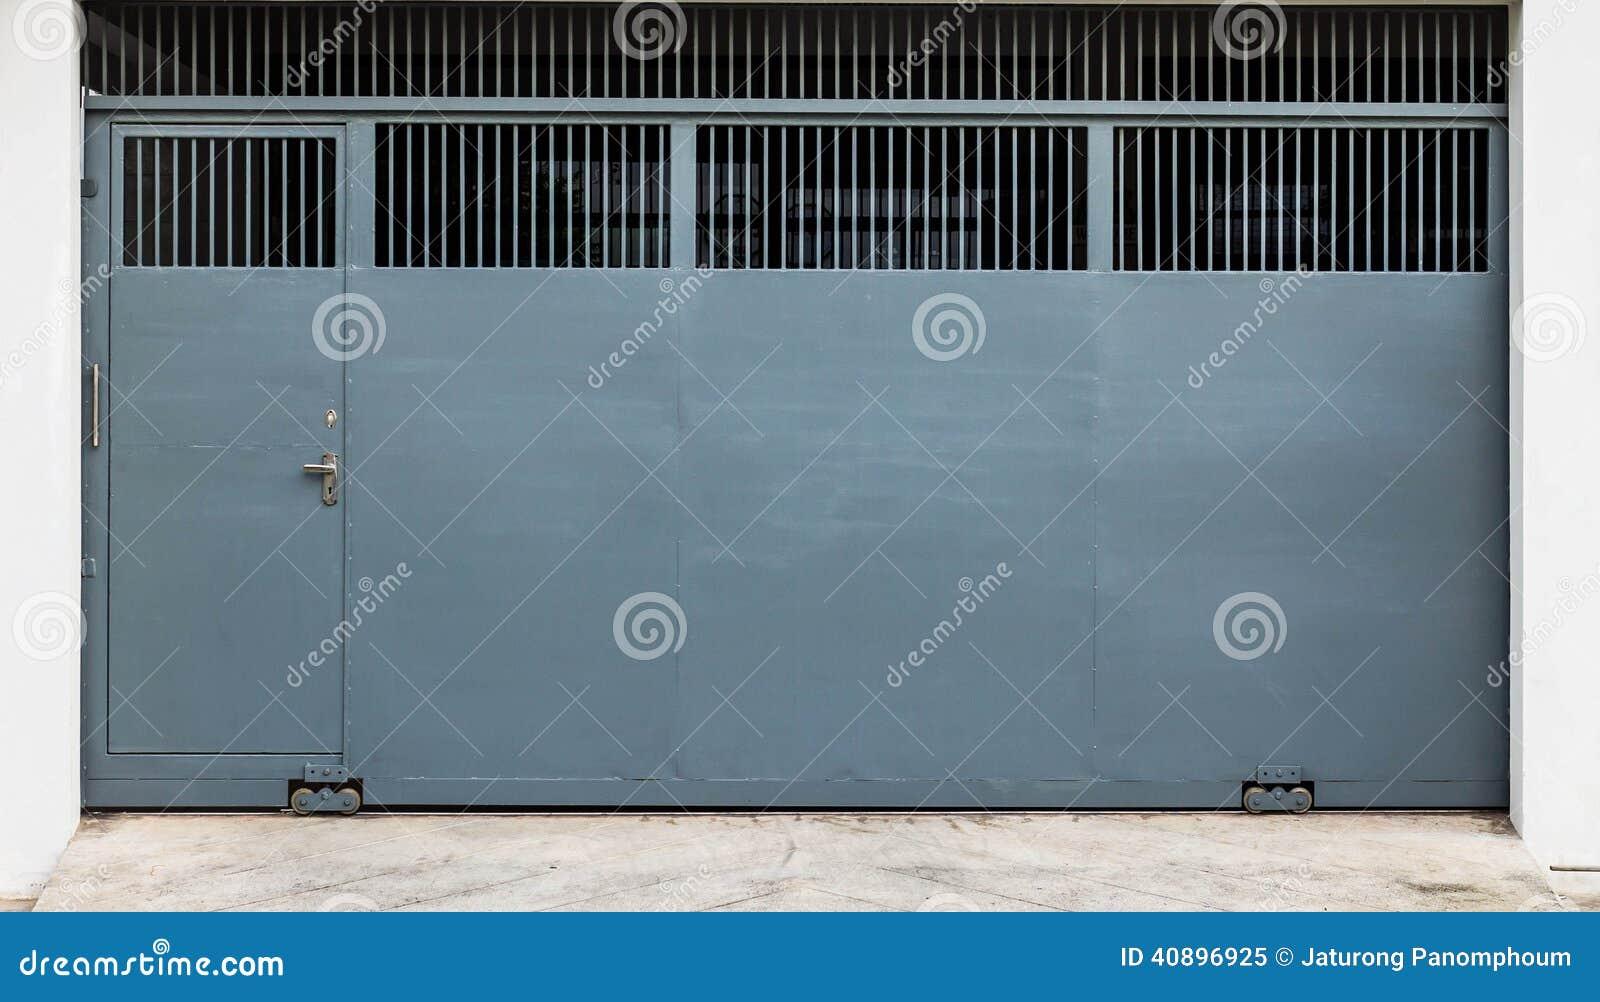 sliding gate plans free. Steel sliding gate  Royalty Free Stock Photo stock image Image of metallic rust 40896925